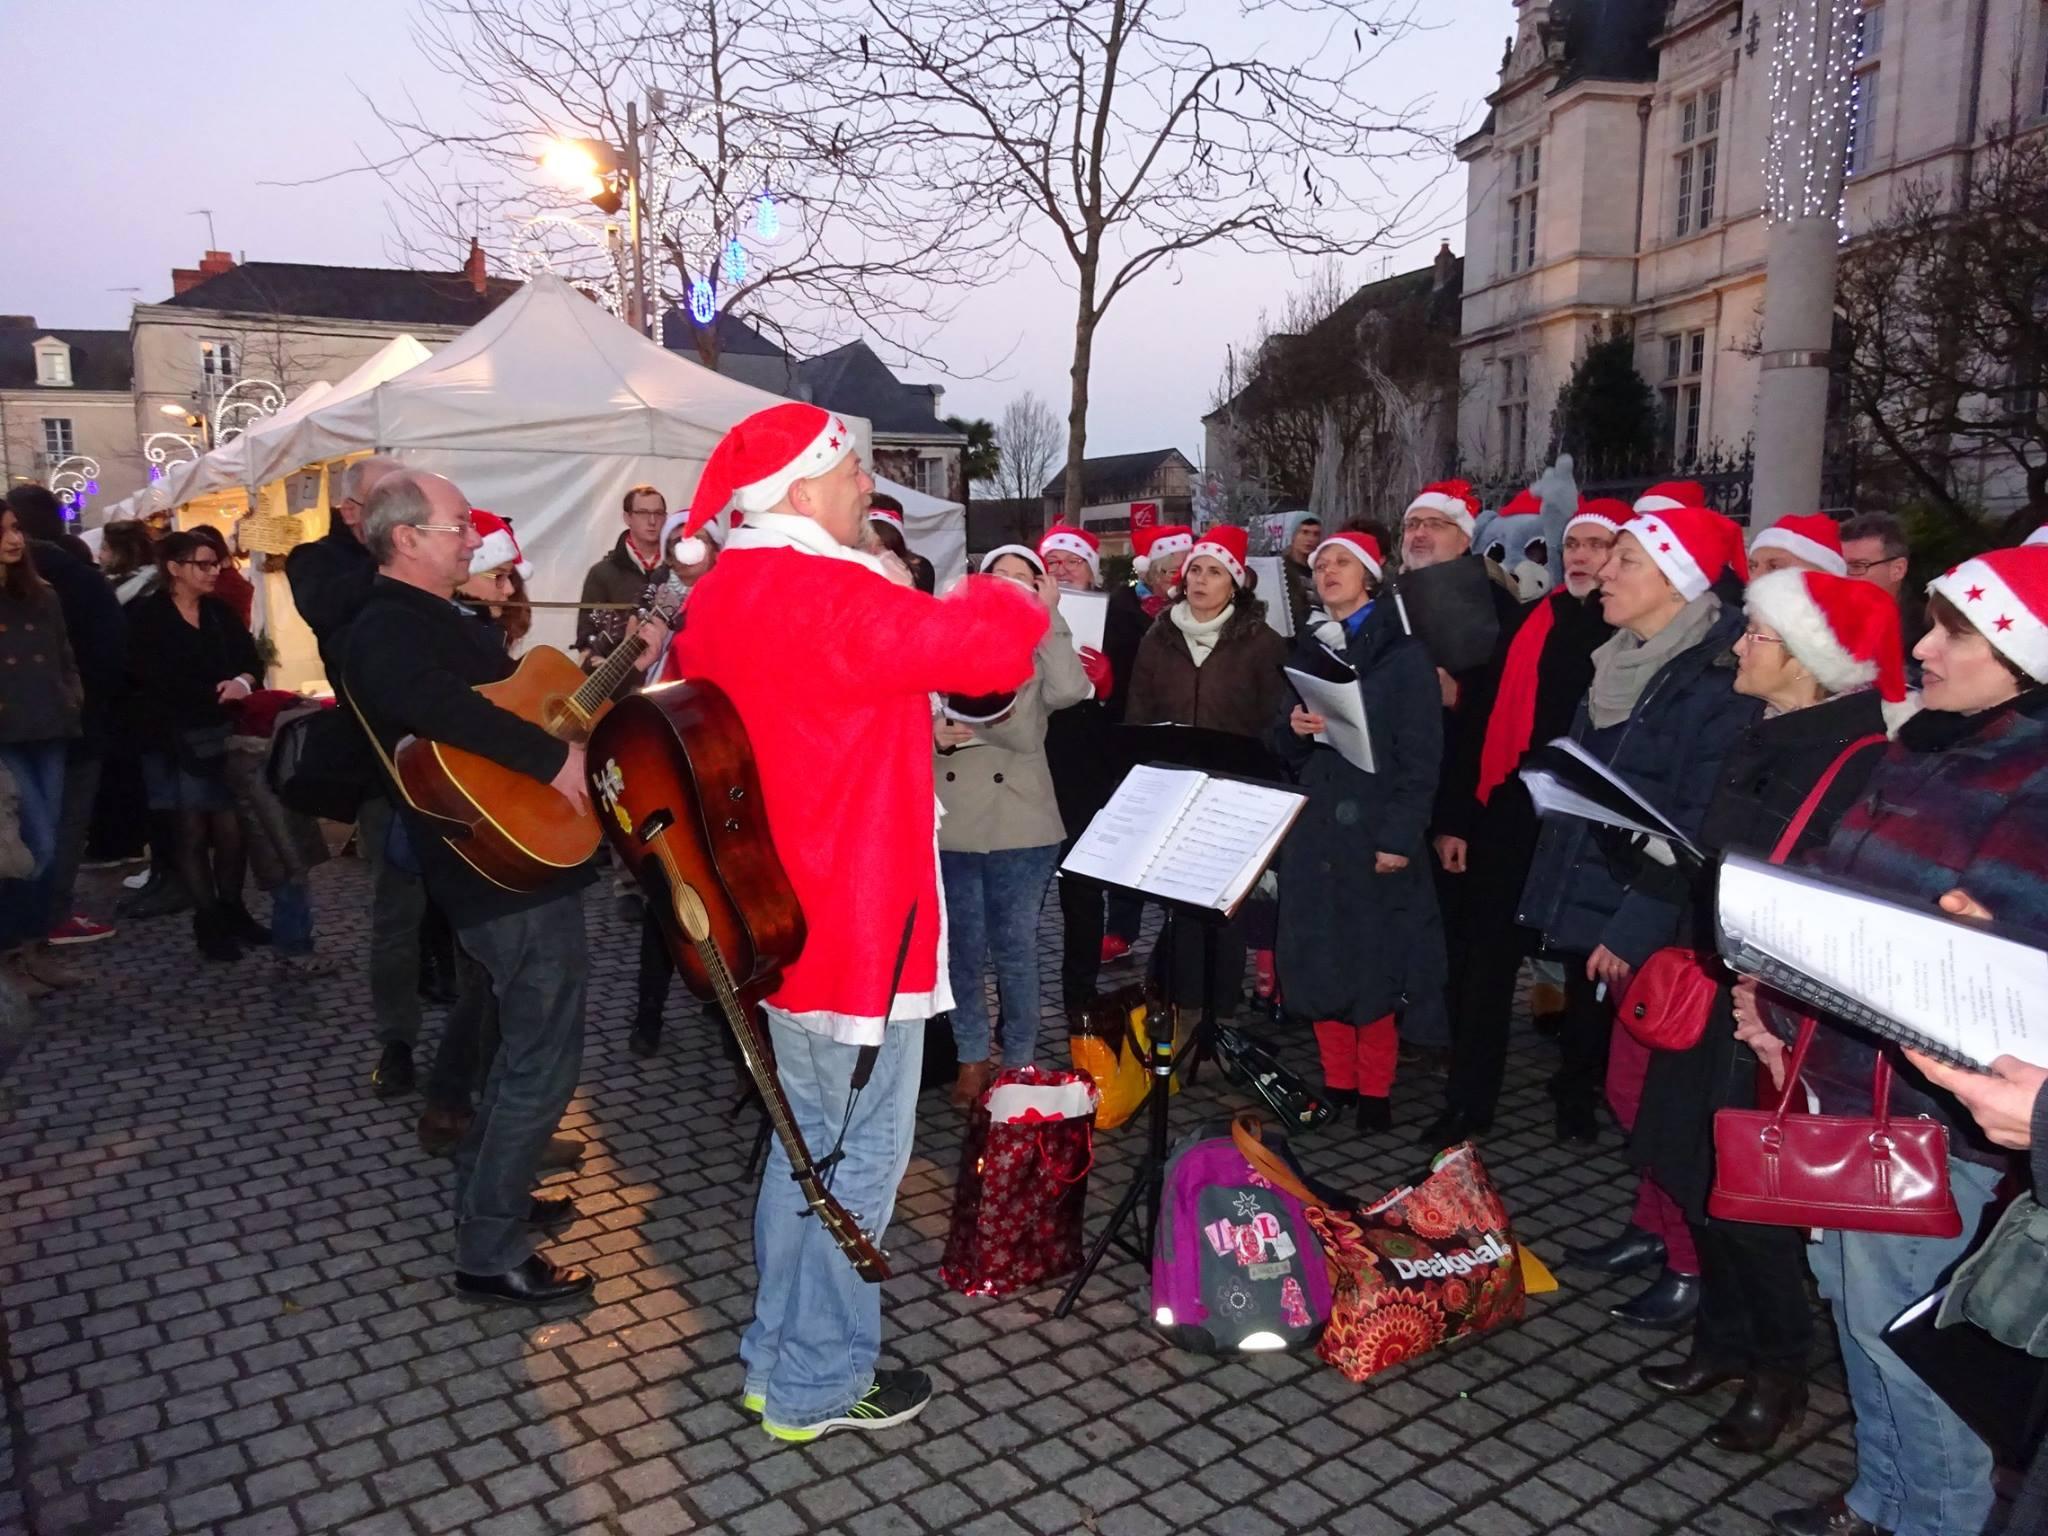 2015-12-12 – Au marché de Noël (7) Sabrina